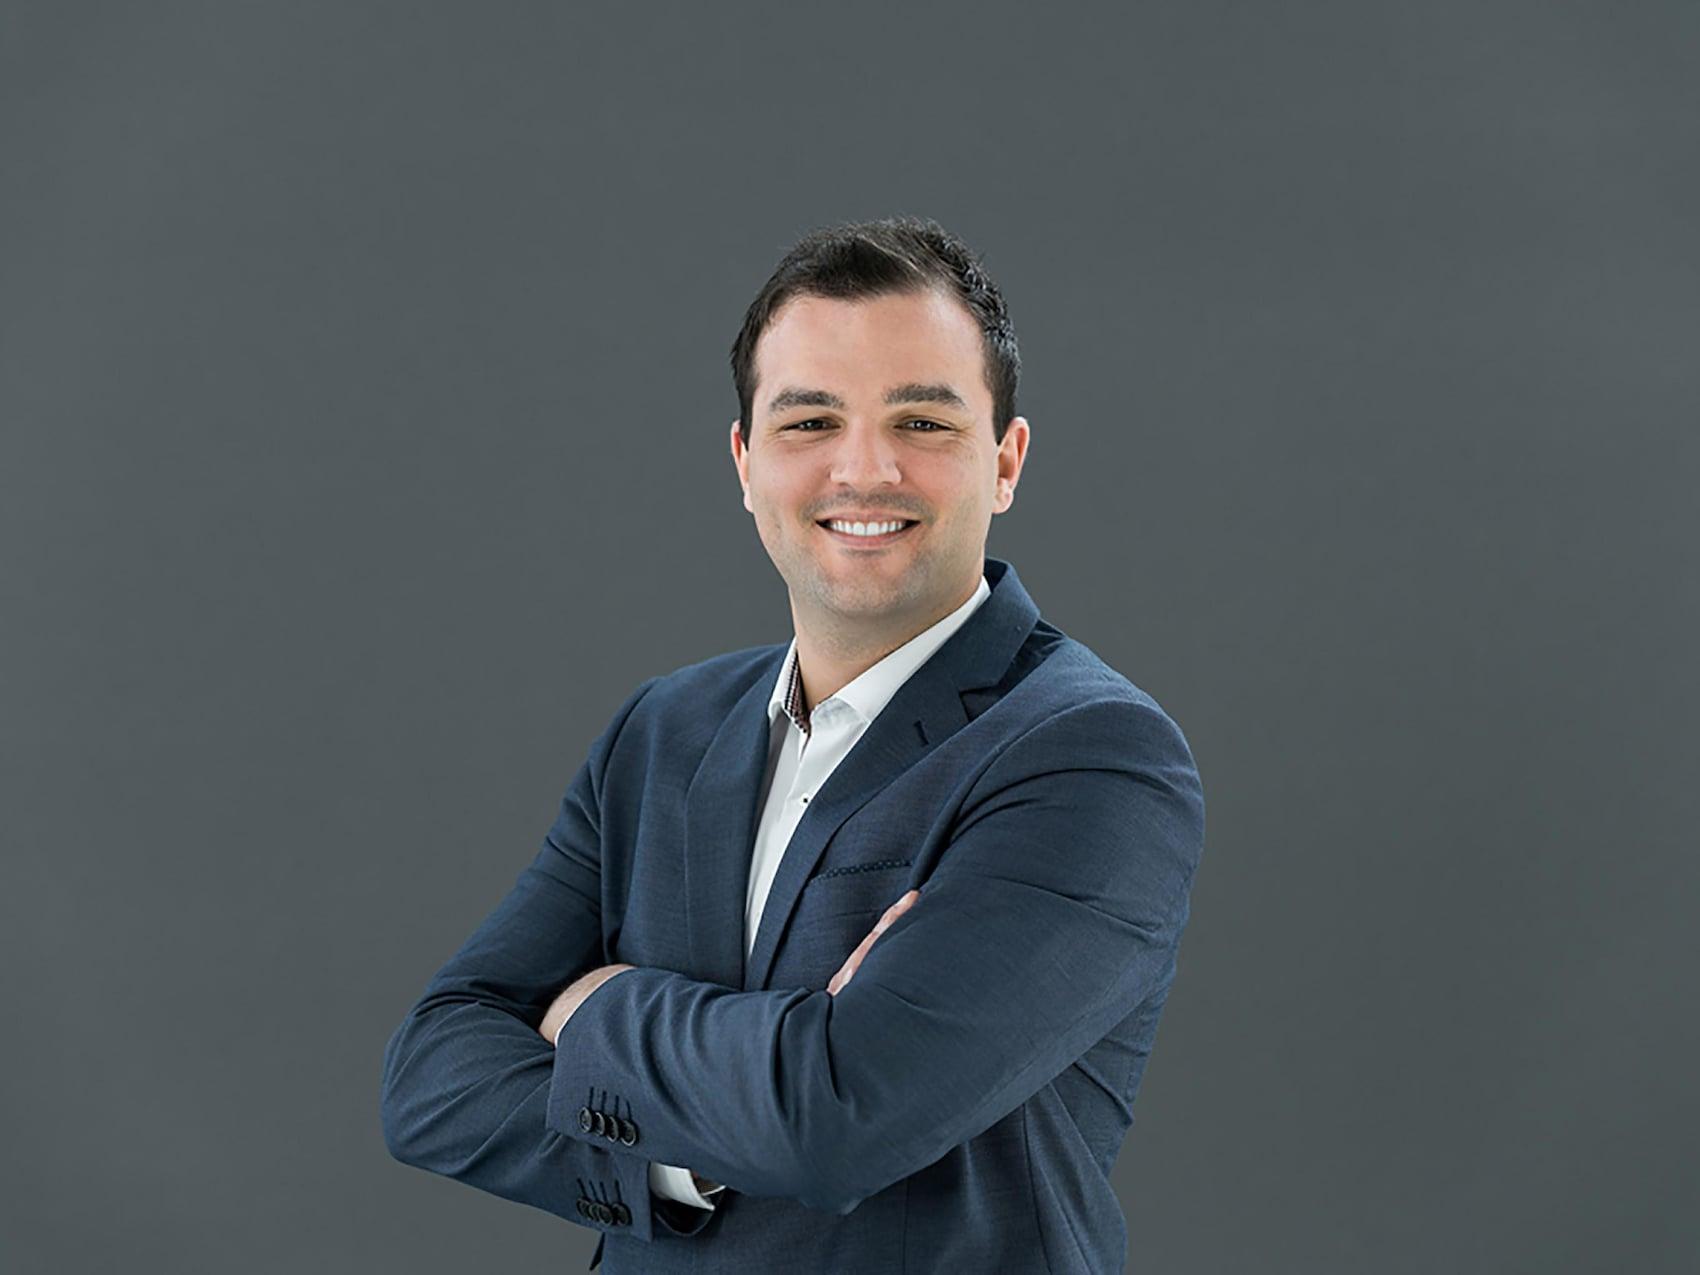 smart Center Grünstadt - Mitarbeiter: Florian Senz